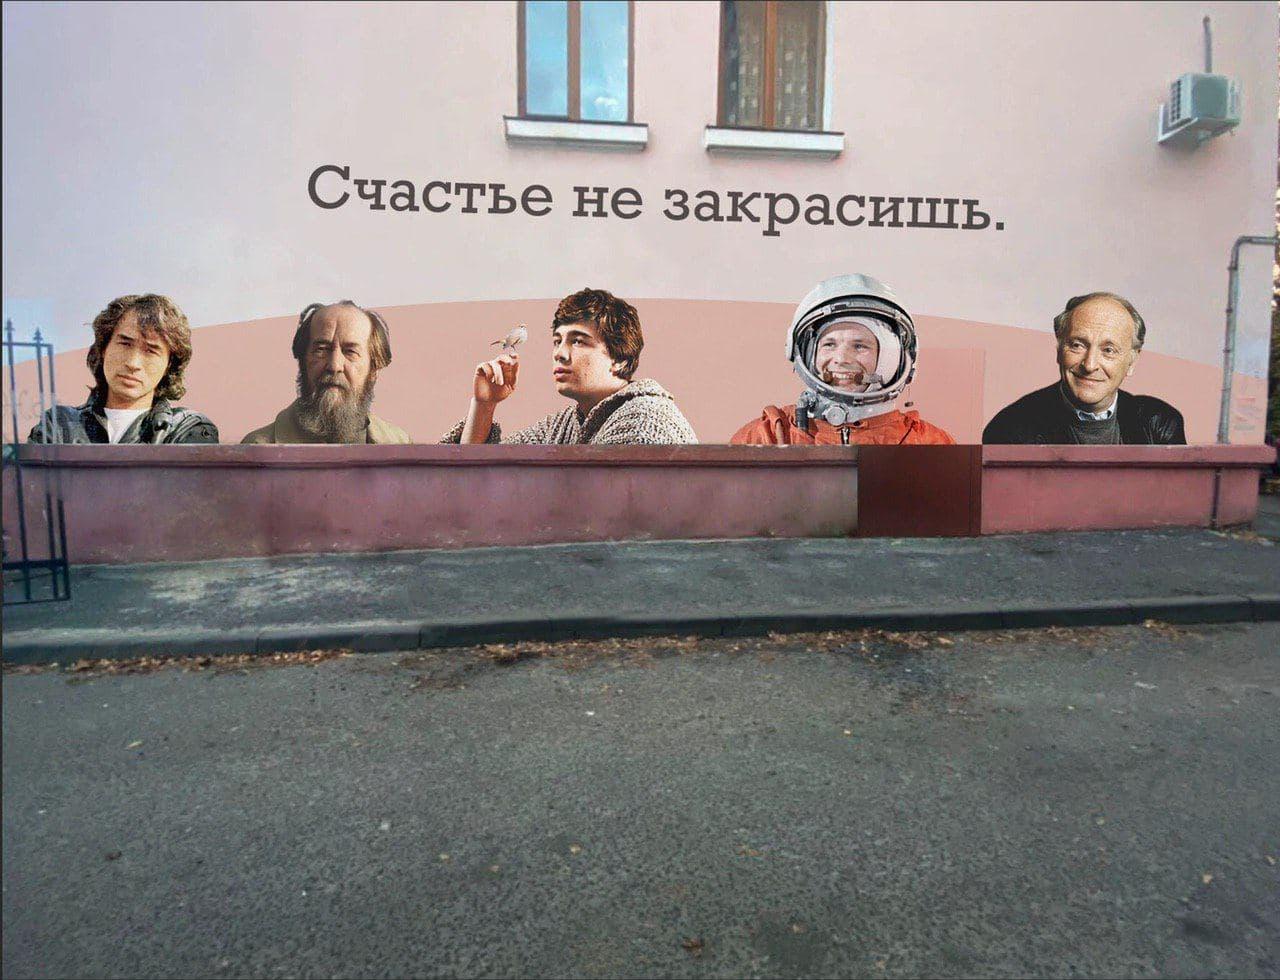 20201124-В Курске появились новые граффити-pic1